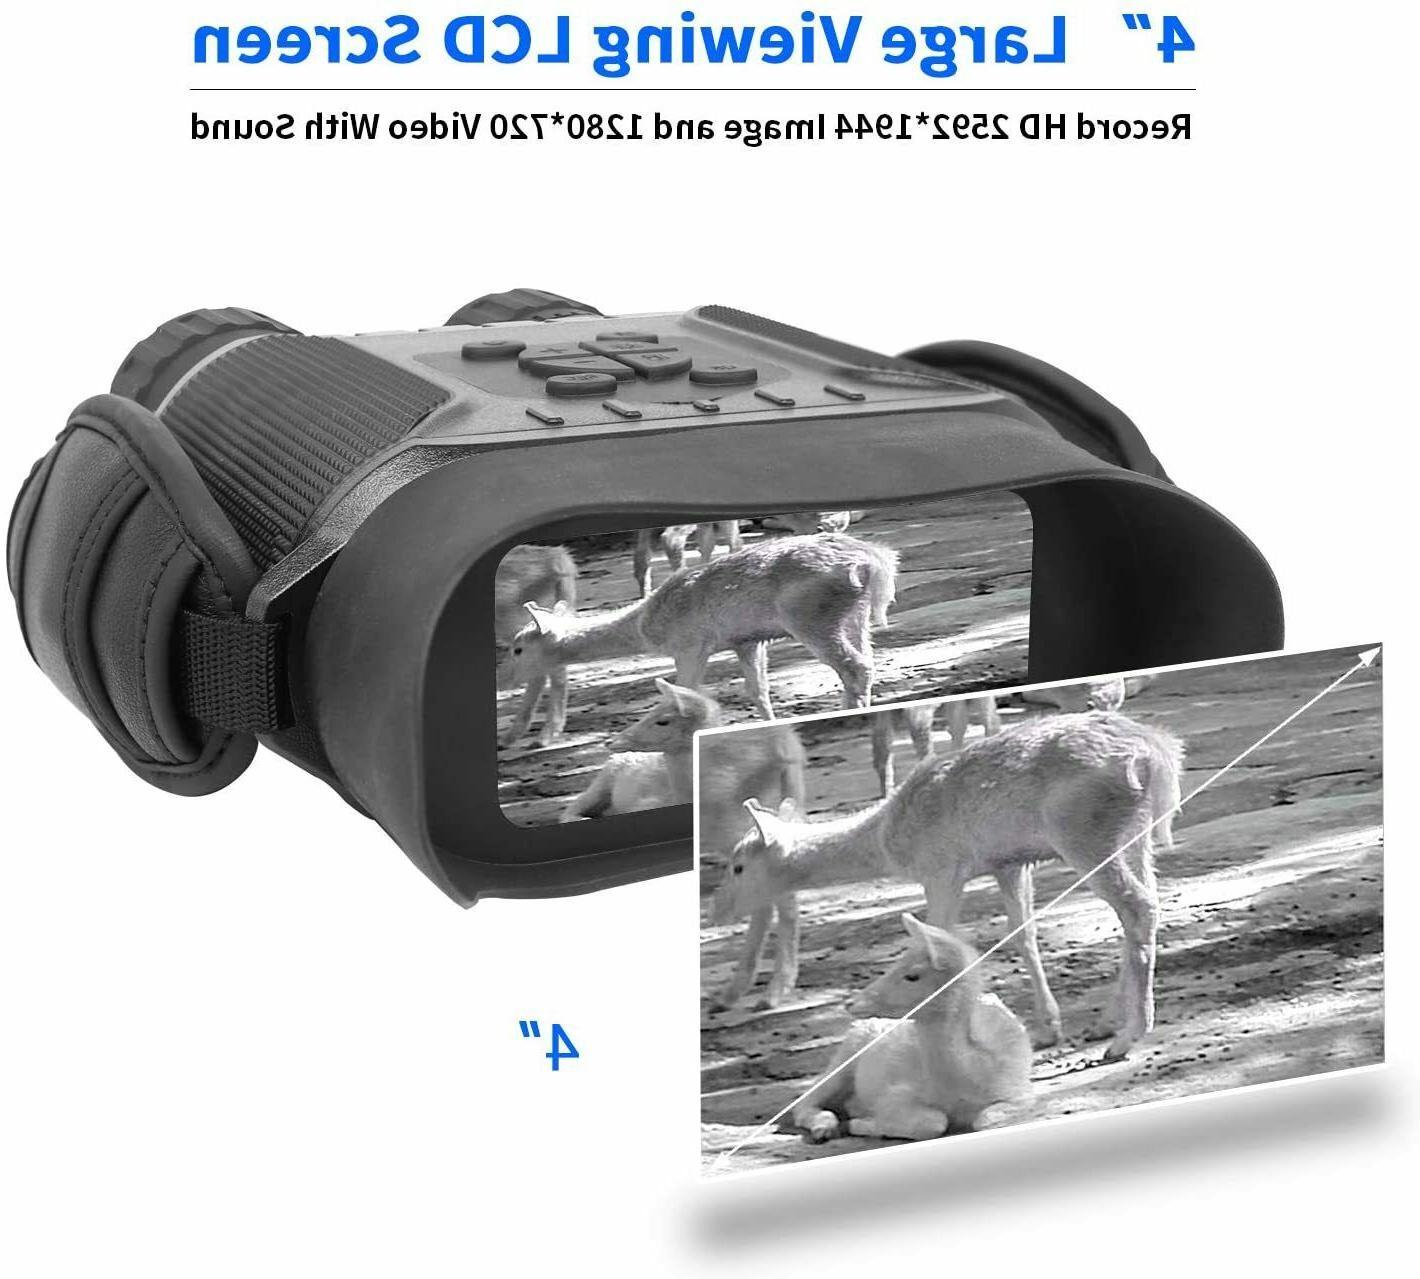 4.5X40mm Digital Binocular Function Takes